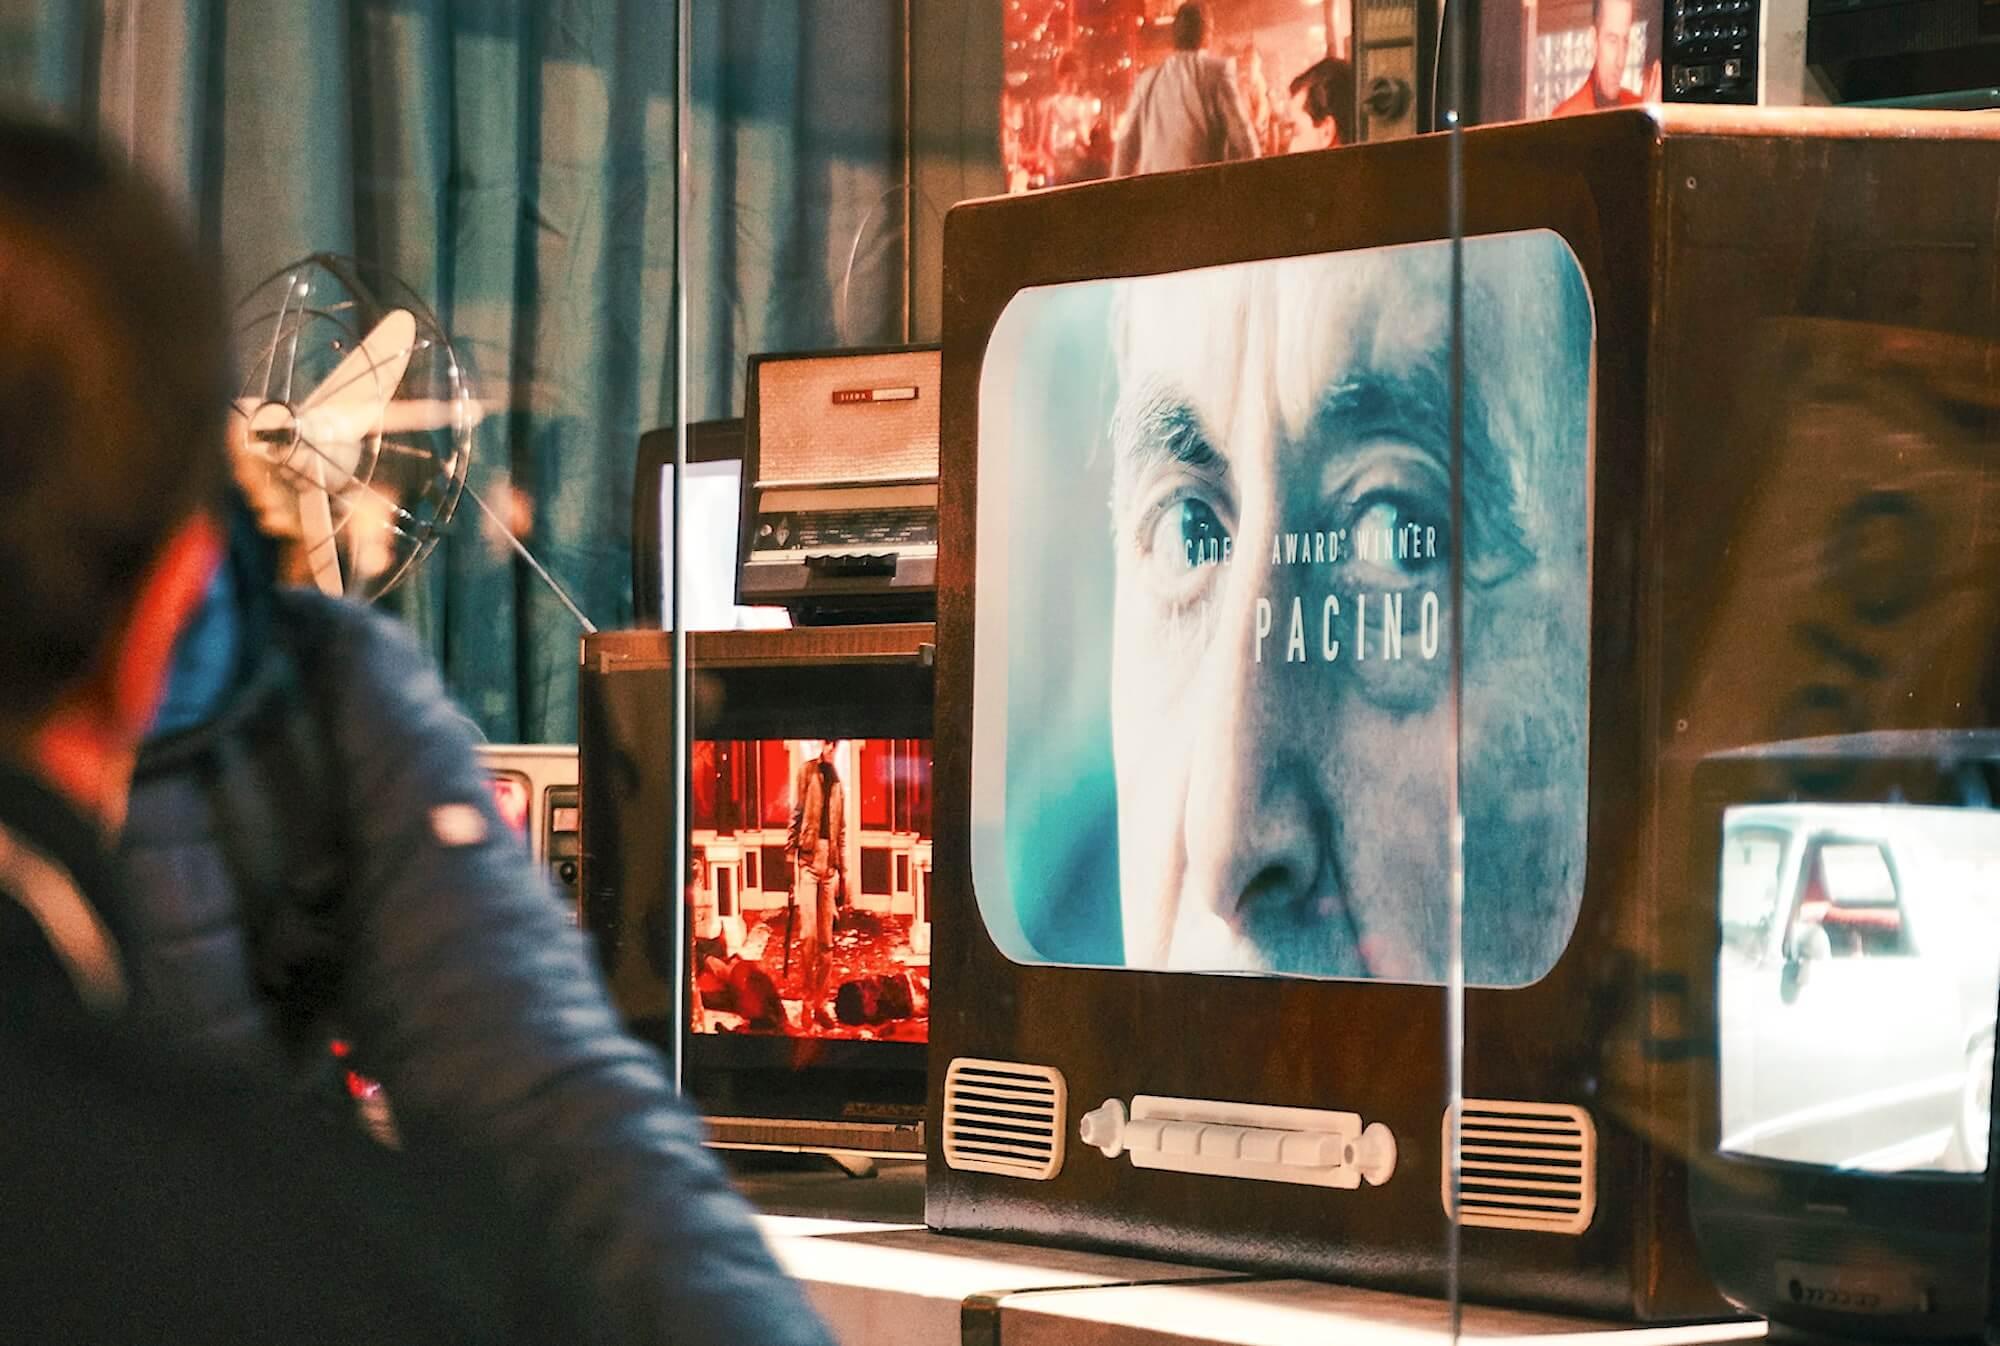 Фотография: Simone Daino. Источник: Unsplash.com